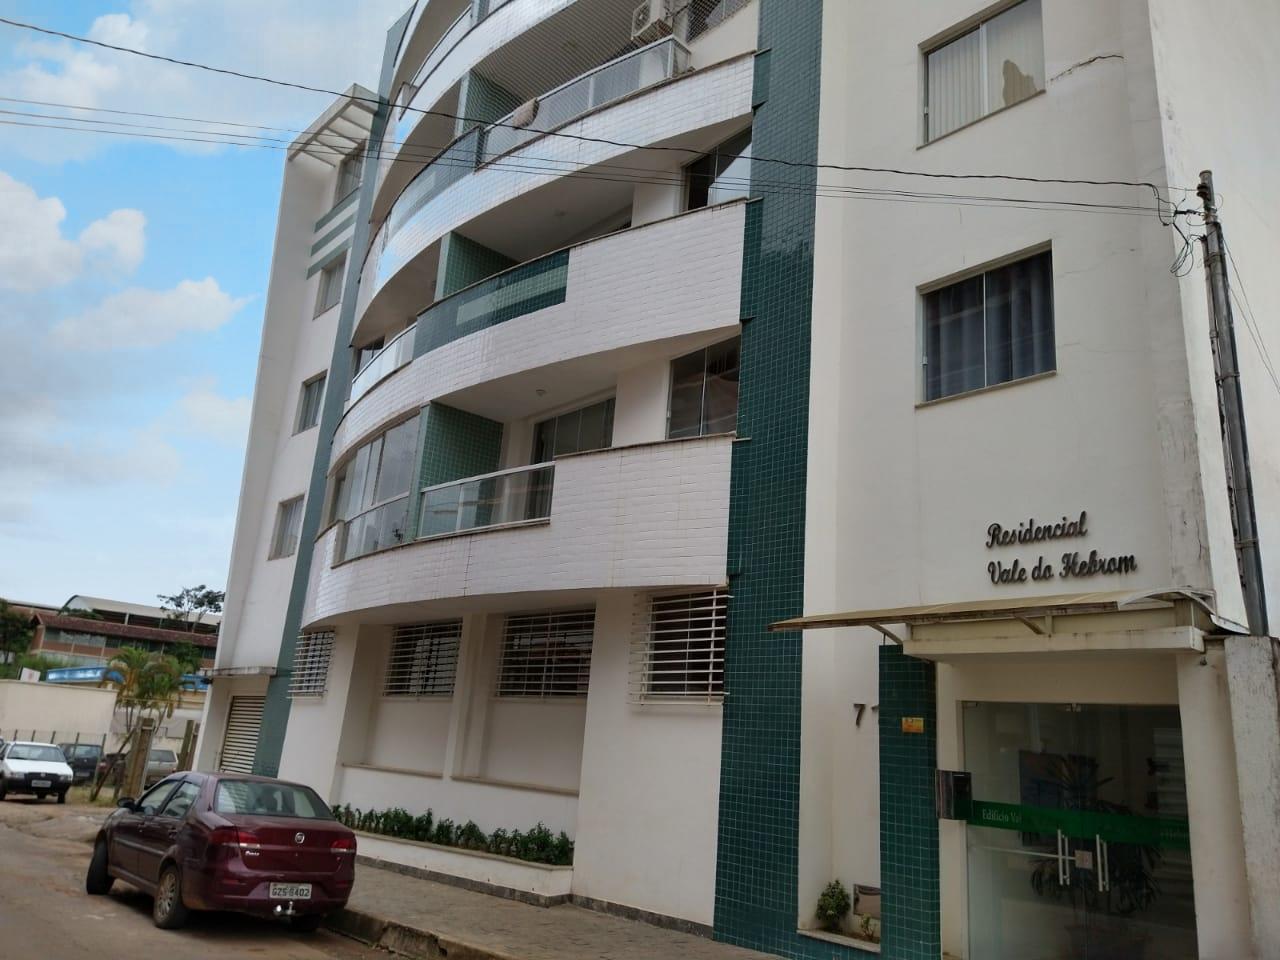 Cobertura Duplex – Residencial Vale do Hebron